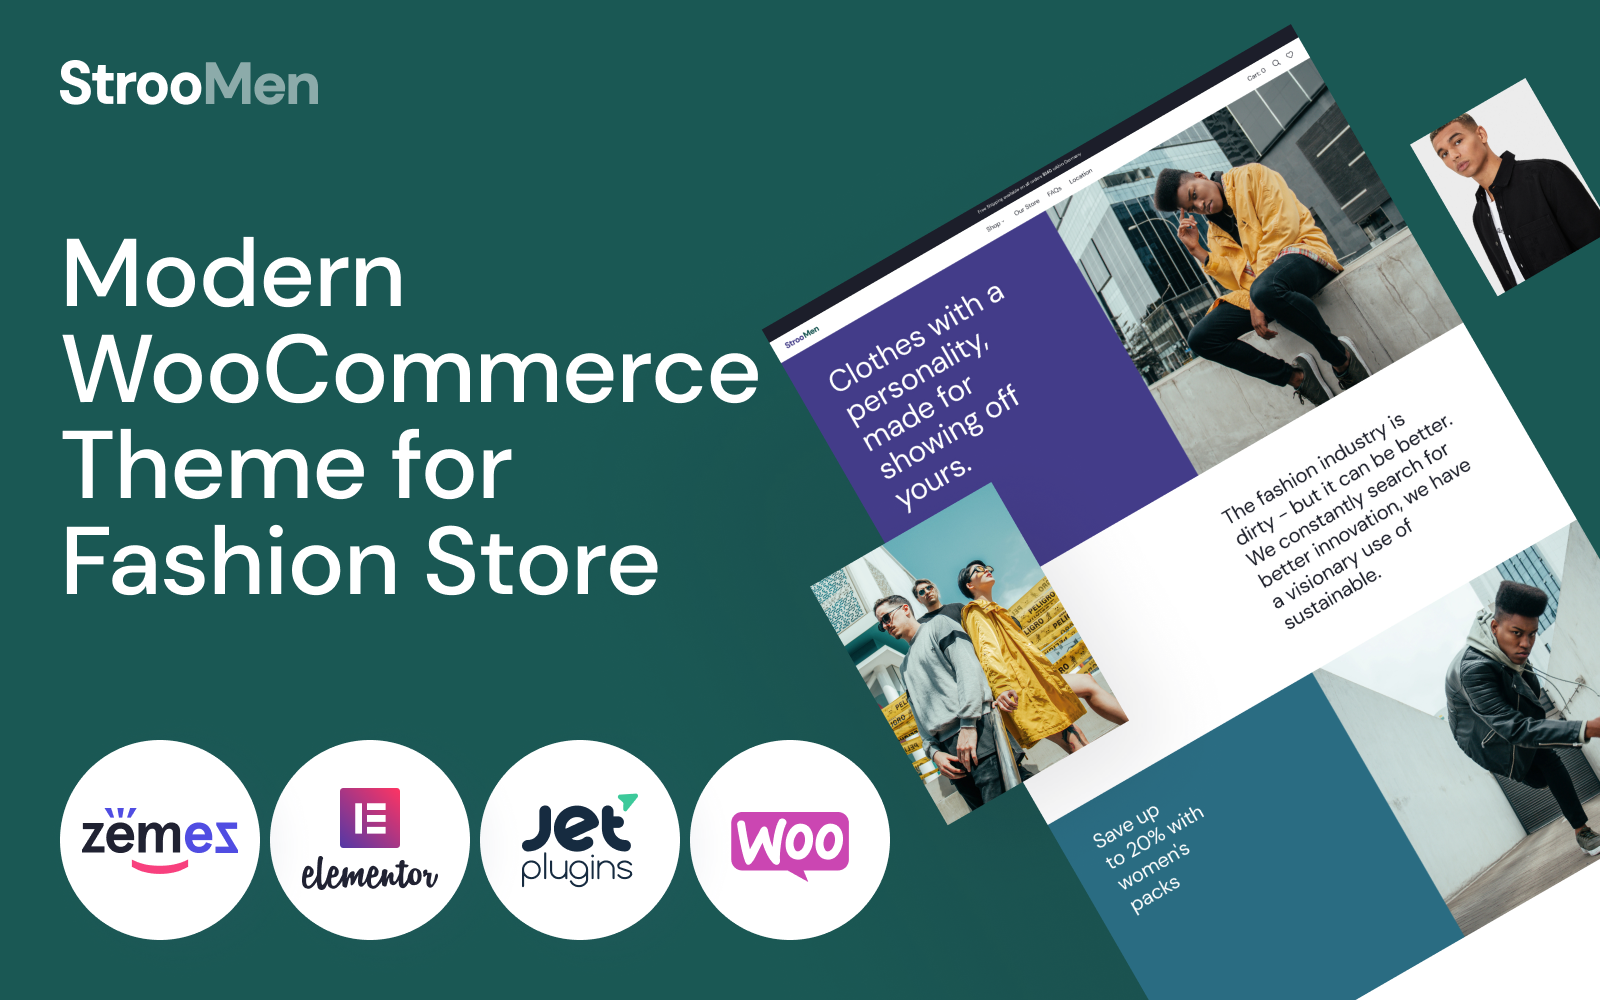 StrooMen - Men's Fashion eCommerce Store WooCommerce Theme